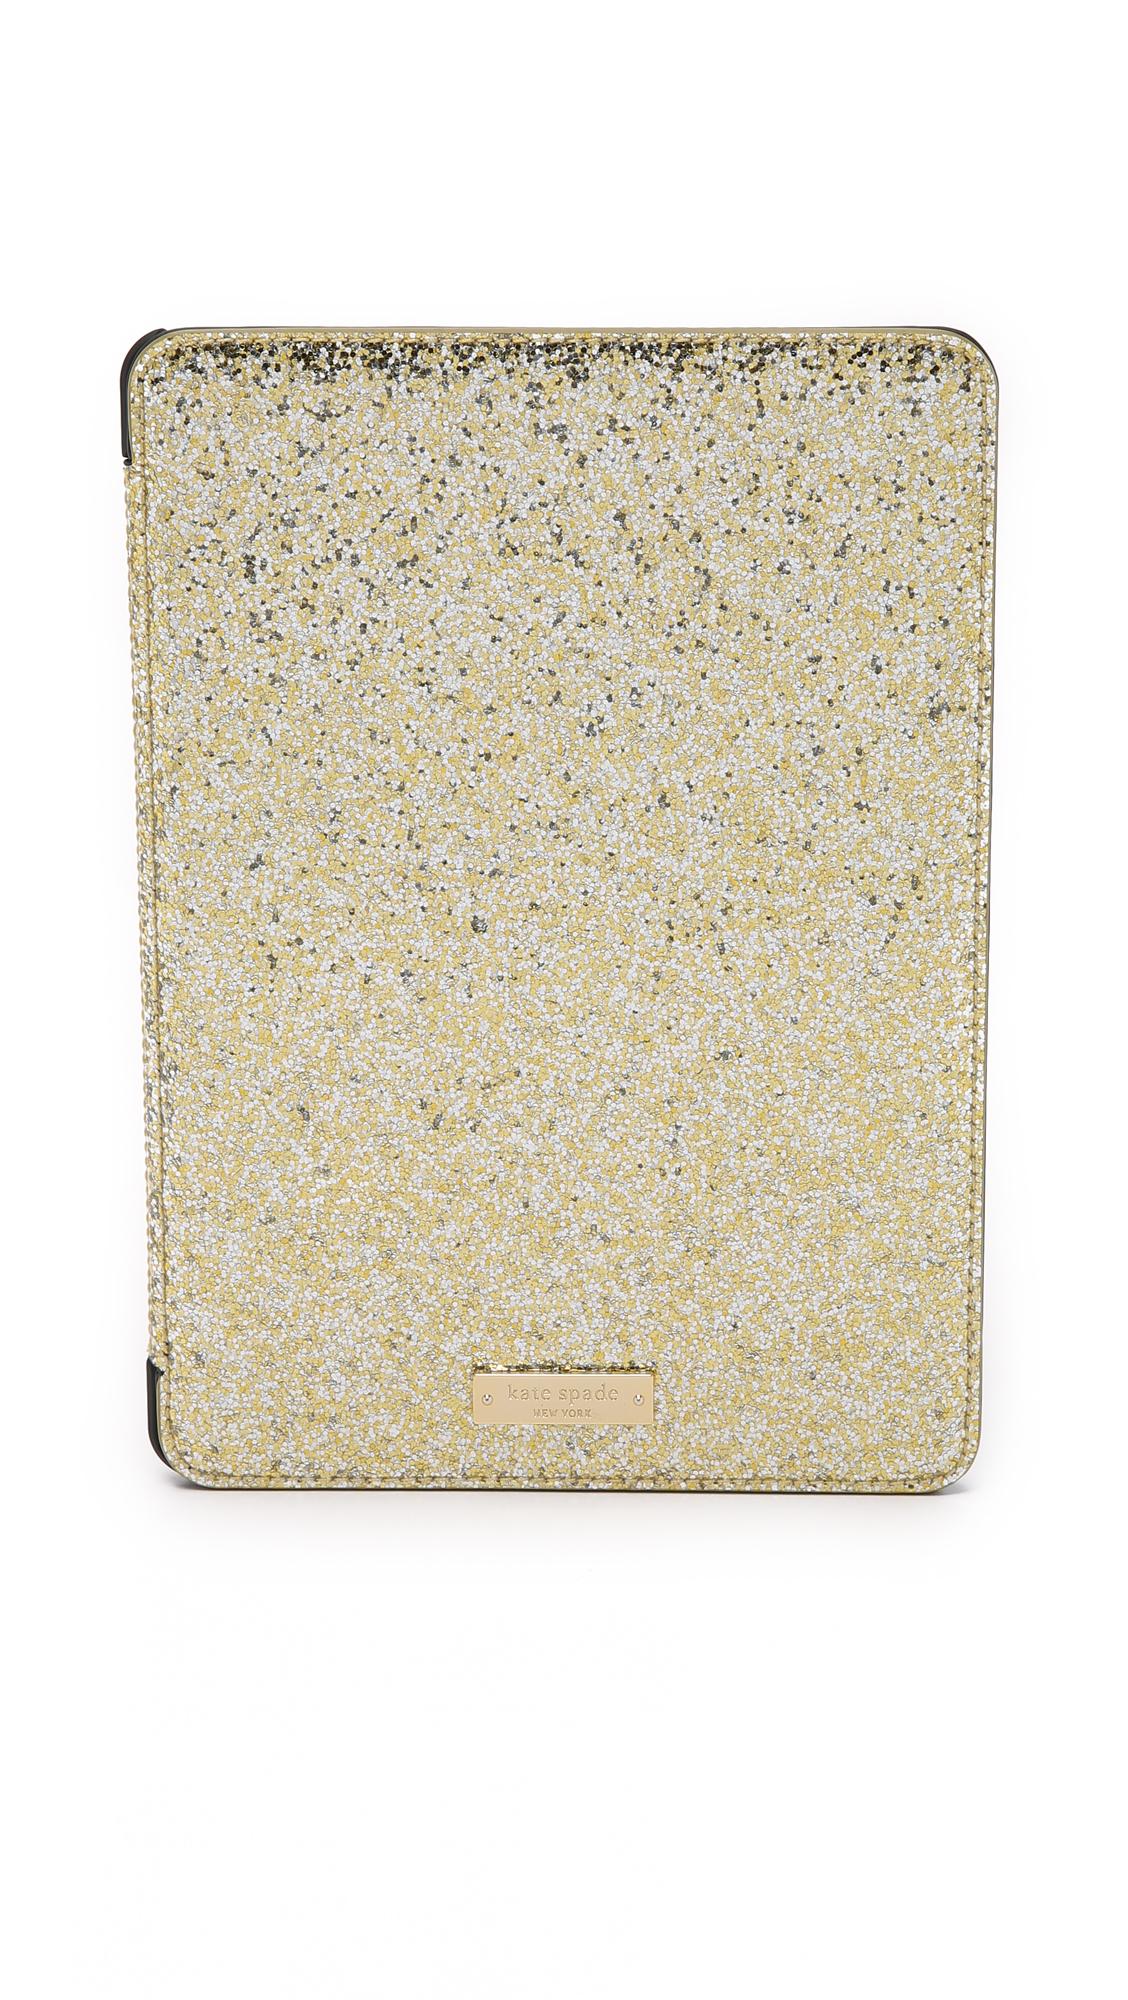 on sale 5c1a5 2cf8b kate spade new york Metallic Glitter Bug Ipad Air 2 Folio Hardcase -  Silver/gold/rose Gold